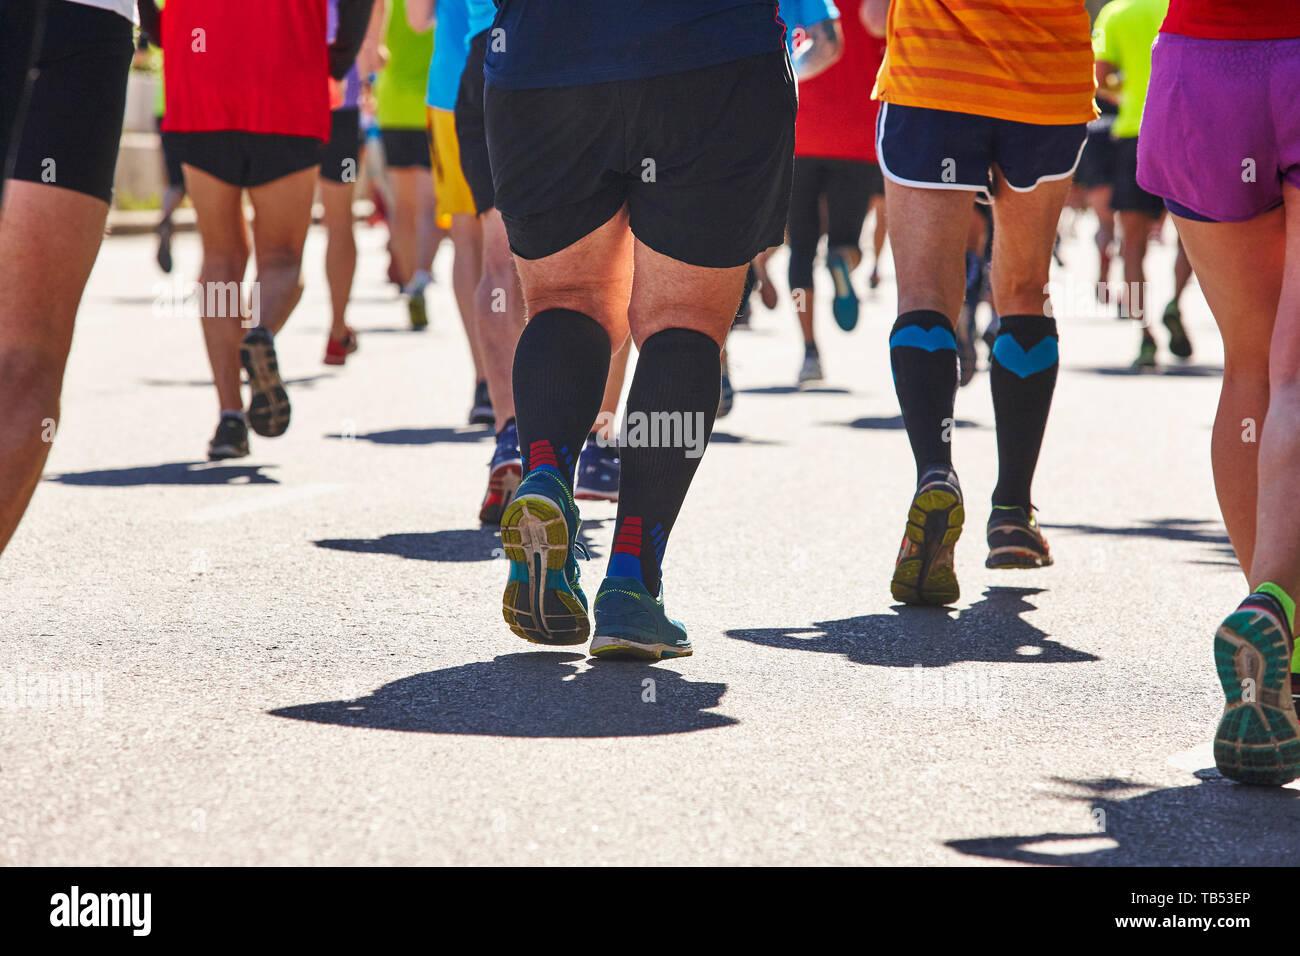 Marathon runners on the street. Healthy lifestyle. Urban athlete endurance - Stock Image